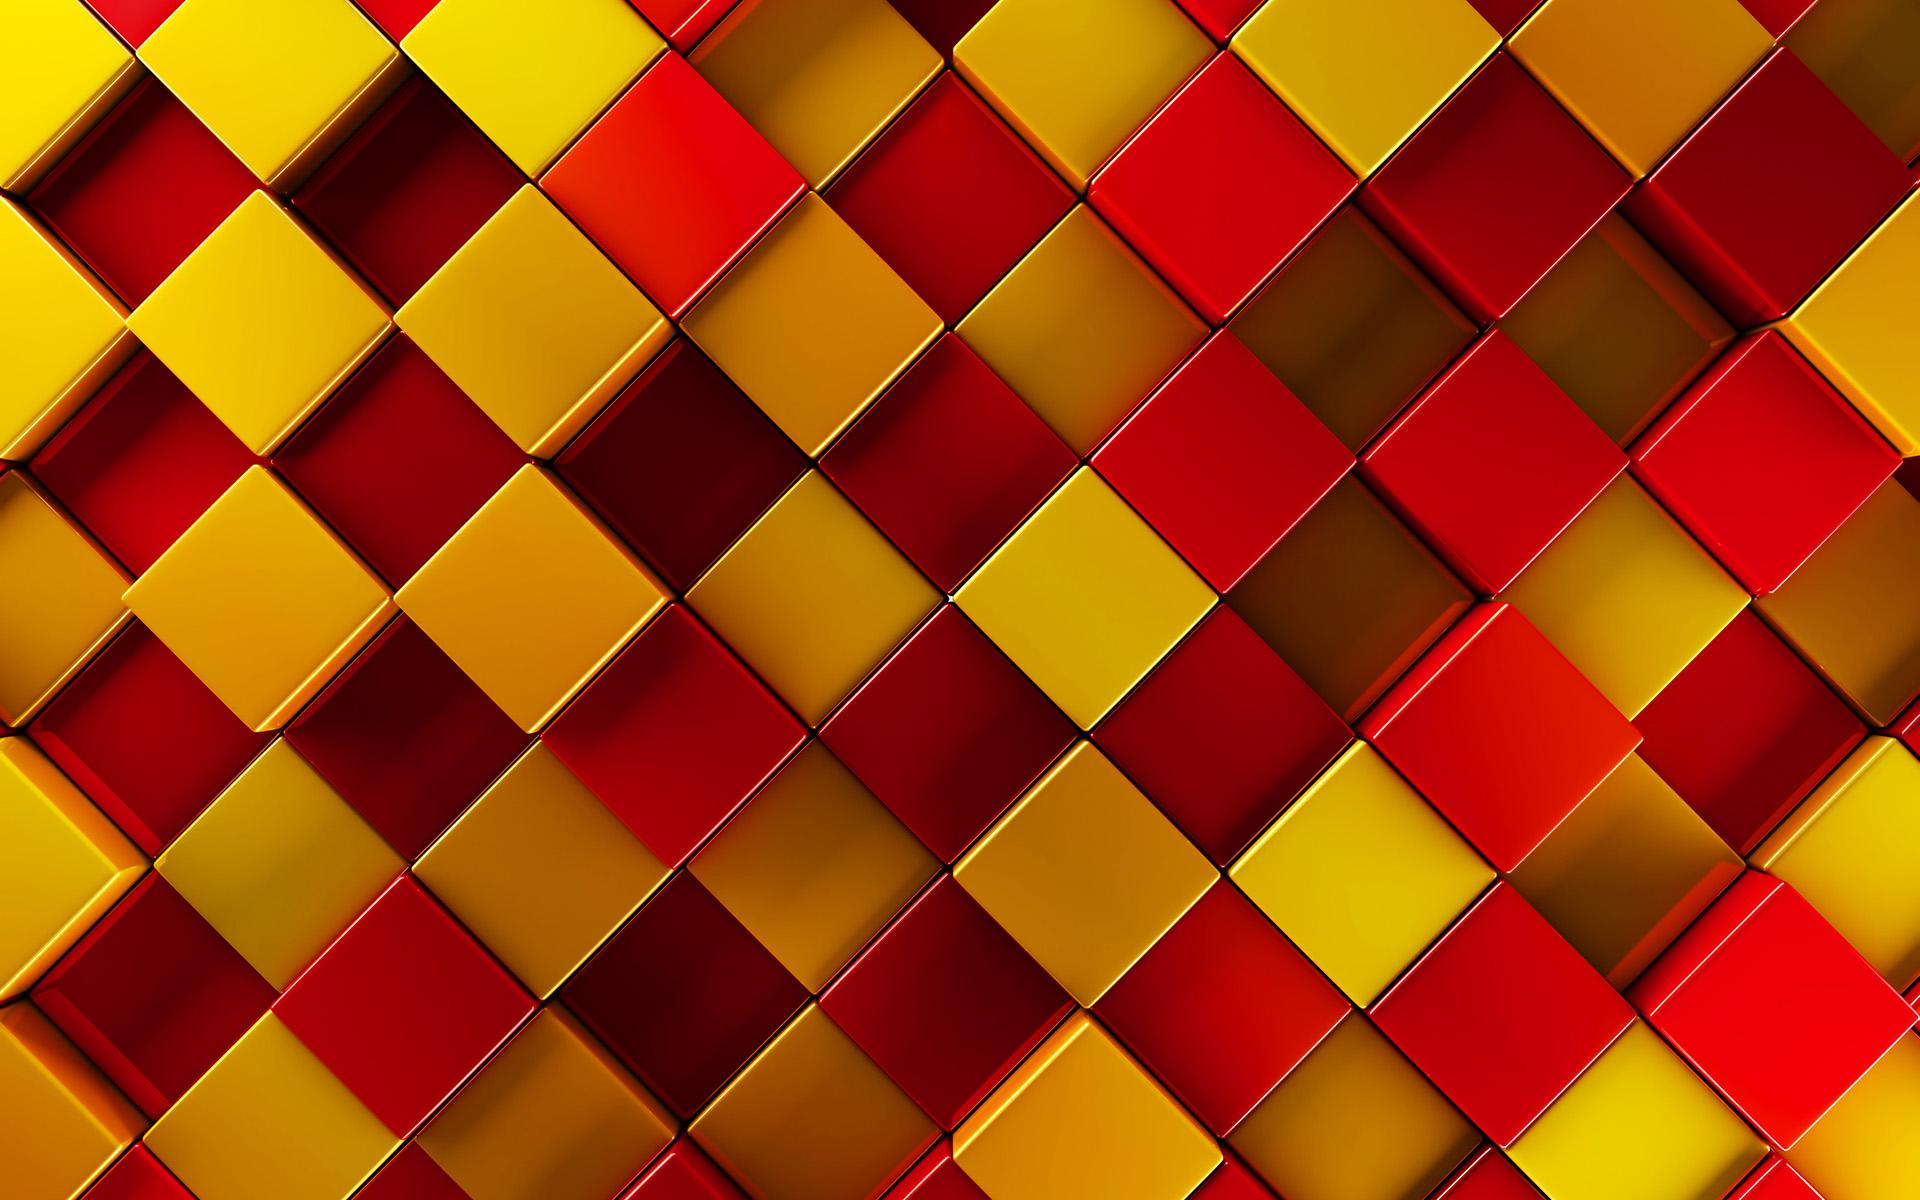 текстура квадраты полосы бесплатно